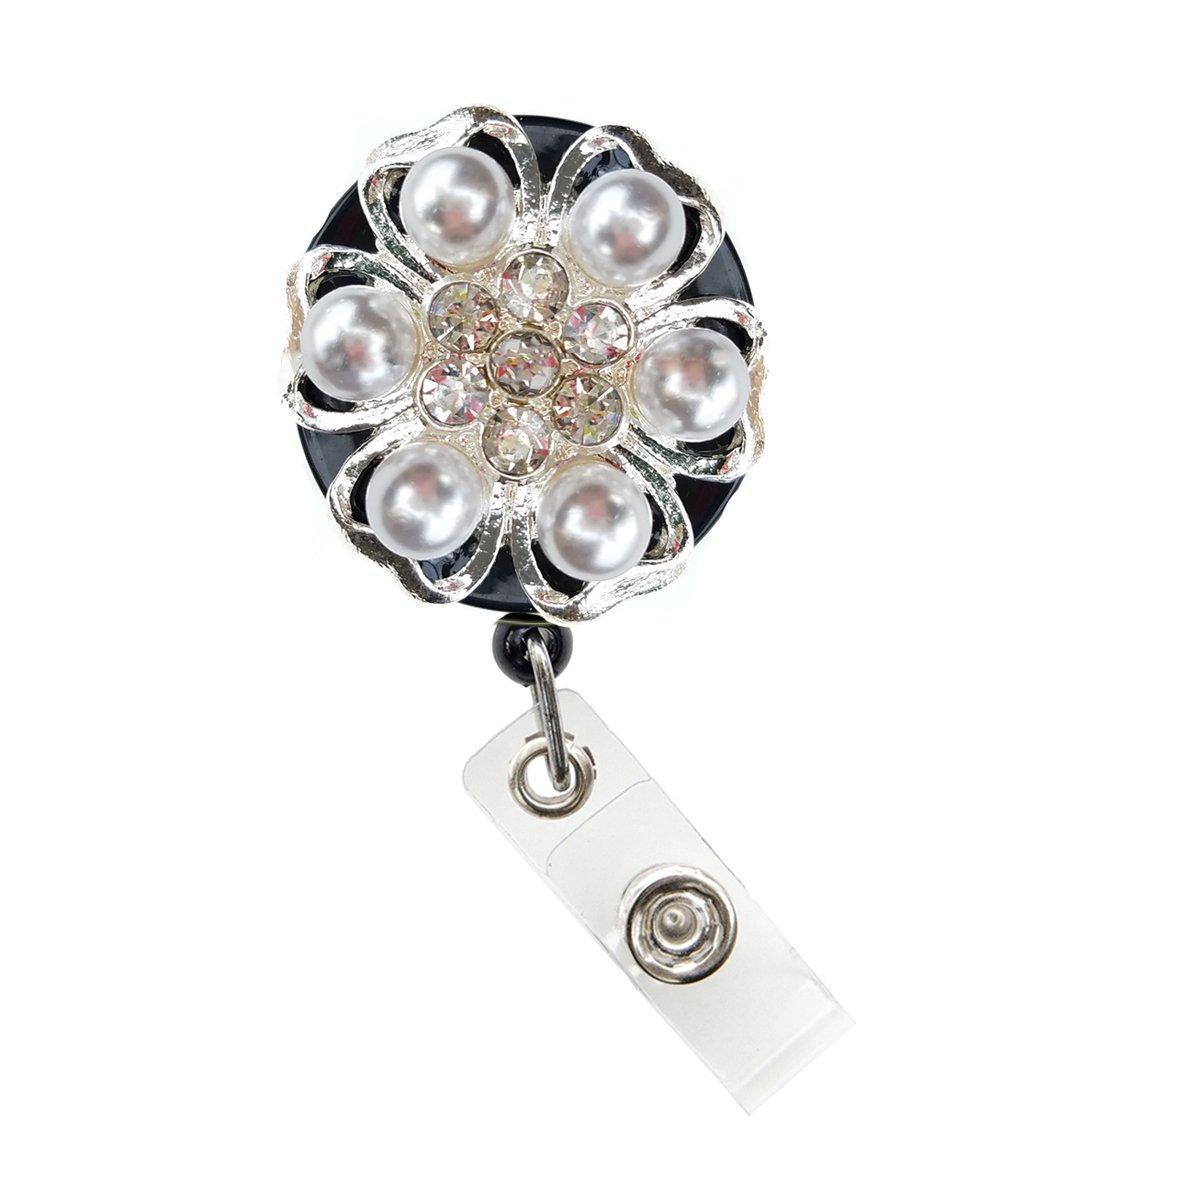 Shimmering Rhinestone Medical Field ID Badge Pull Reels Retractable ID Badge Holders (White Pearl)